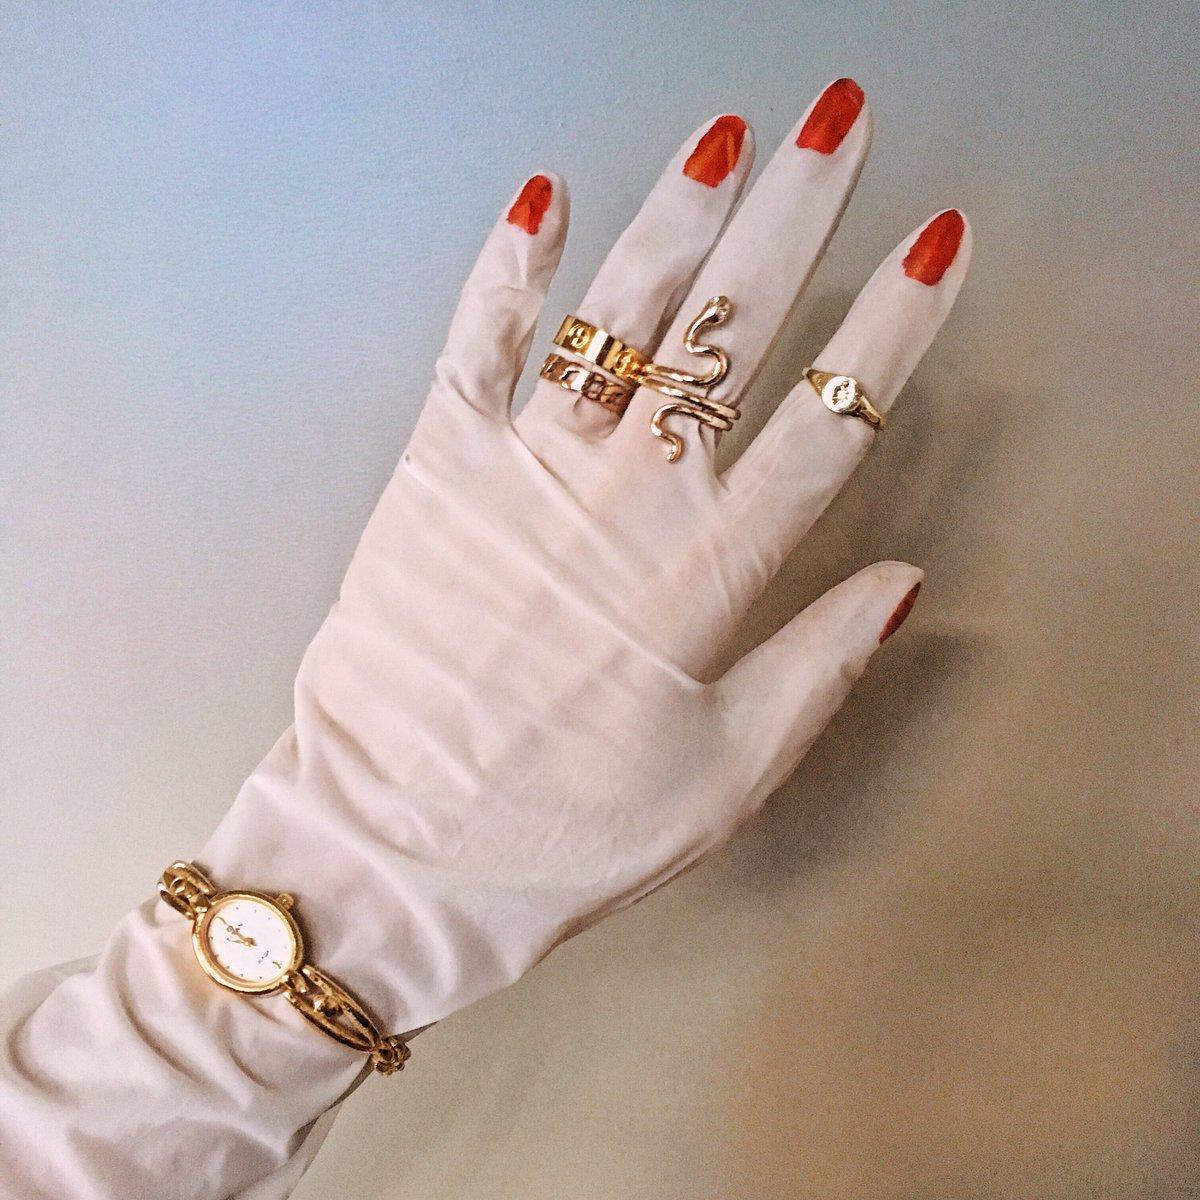 Best nails I got so far  jk! #quarantinemanicure #nailart pic.twitter.com/vP1DaaButa